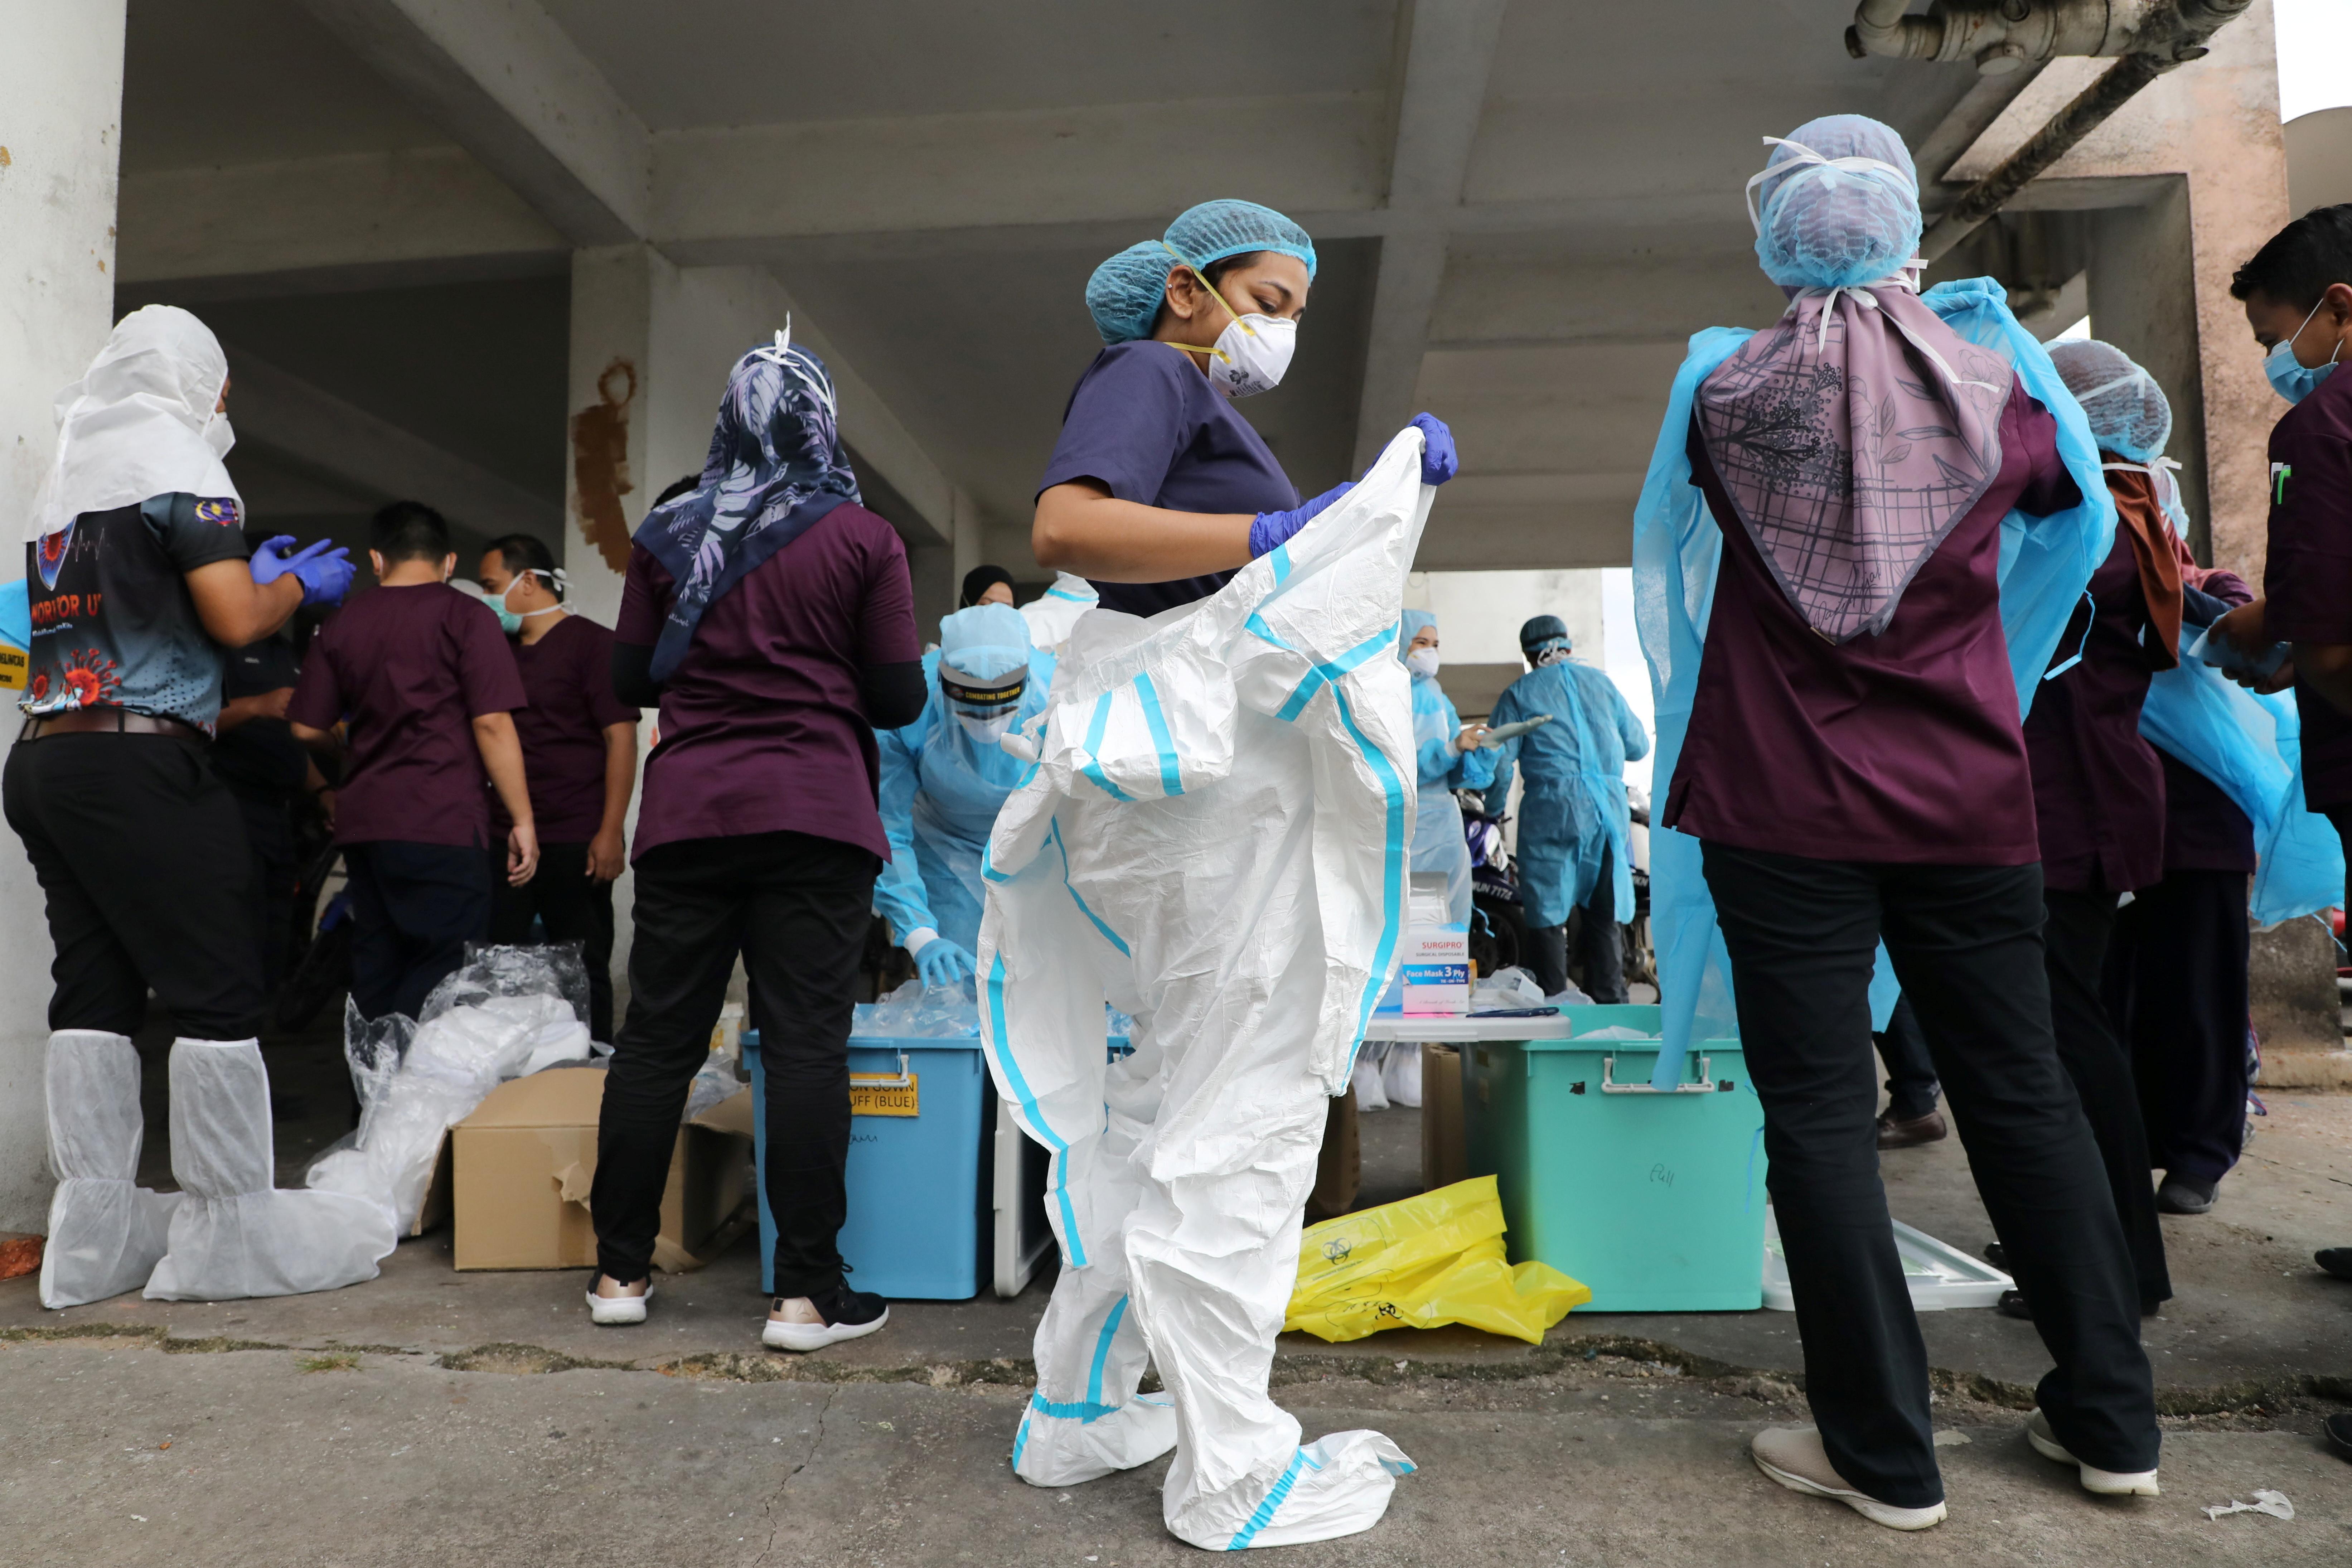 Medical workers put on personal protective equipment before a mass coronavirus disease (COVID-19) swab test in Petaling Jaya, Malaysia October 21, 2020. REUTERS/Lim Huey Teng - RC2YMJ9CKP2T